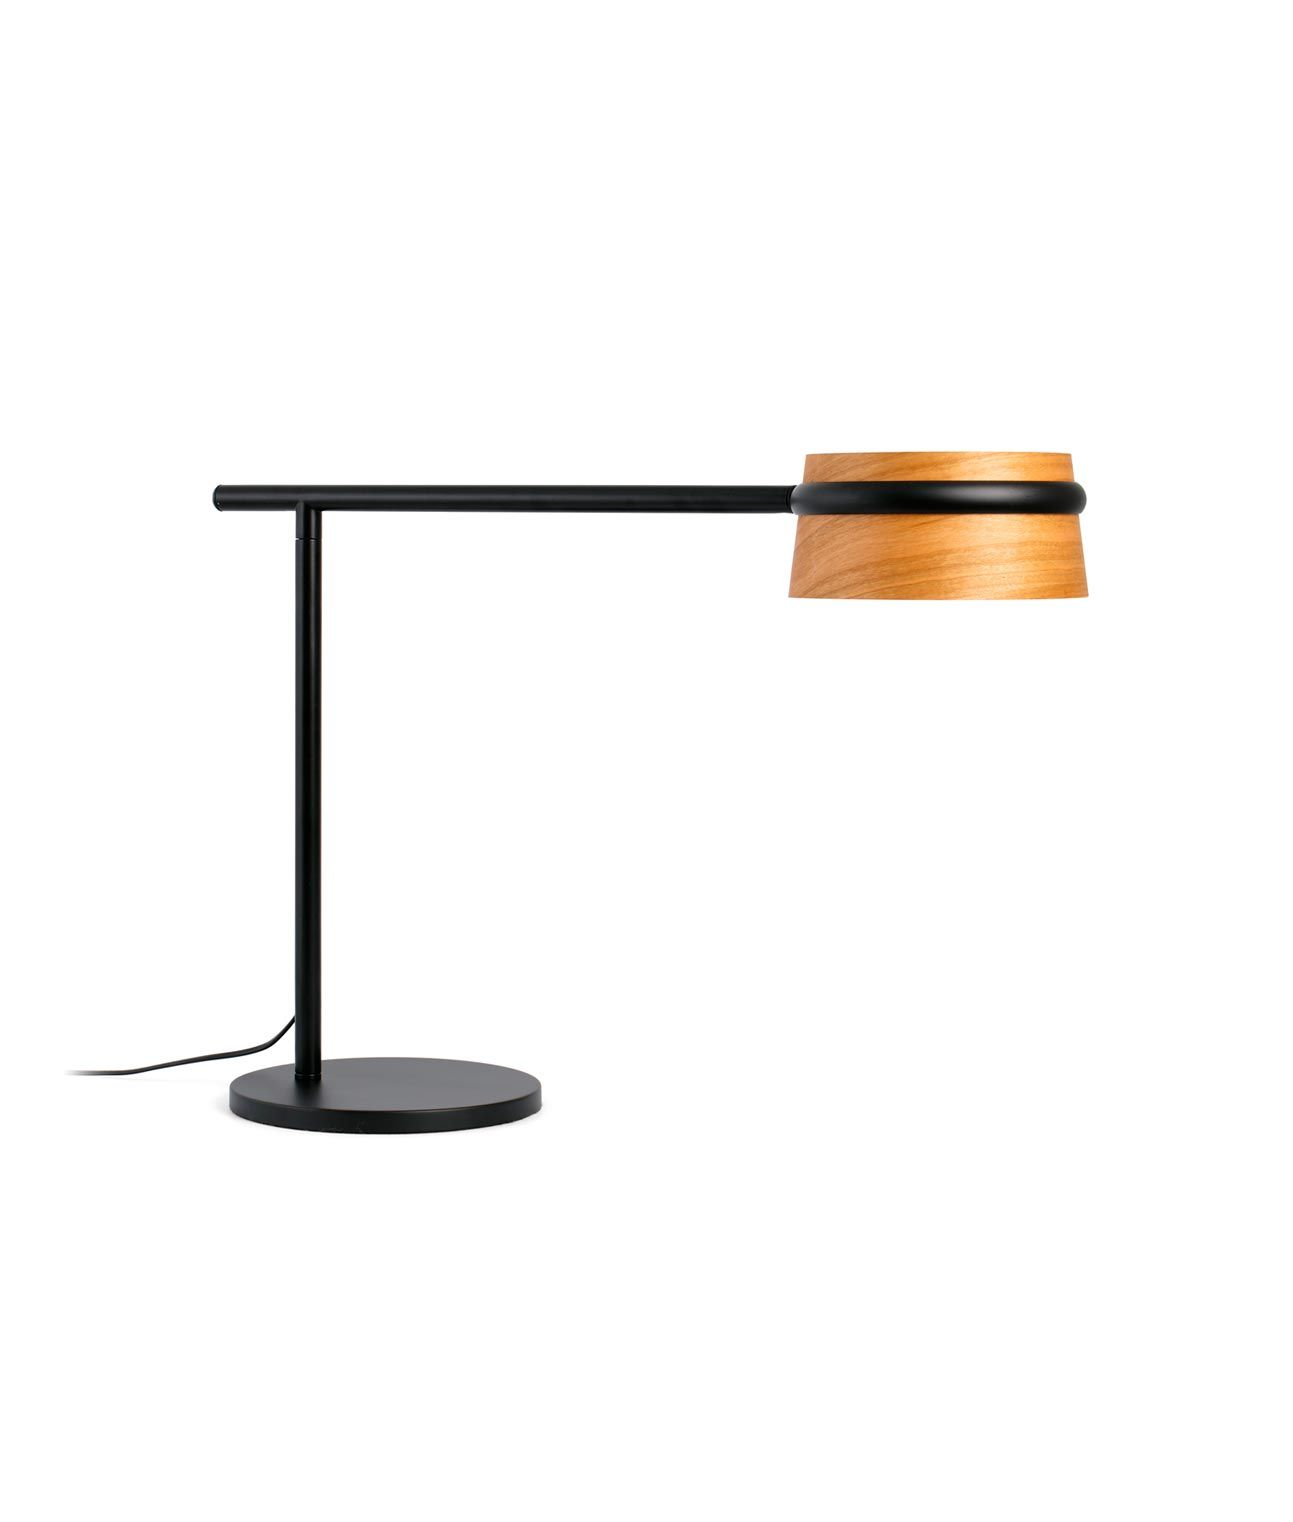 Lámpara mesa negra y madera LOOP LED detalle